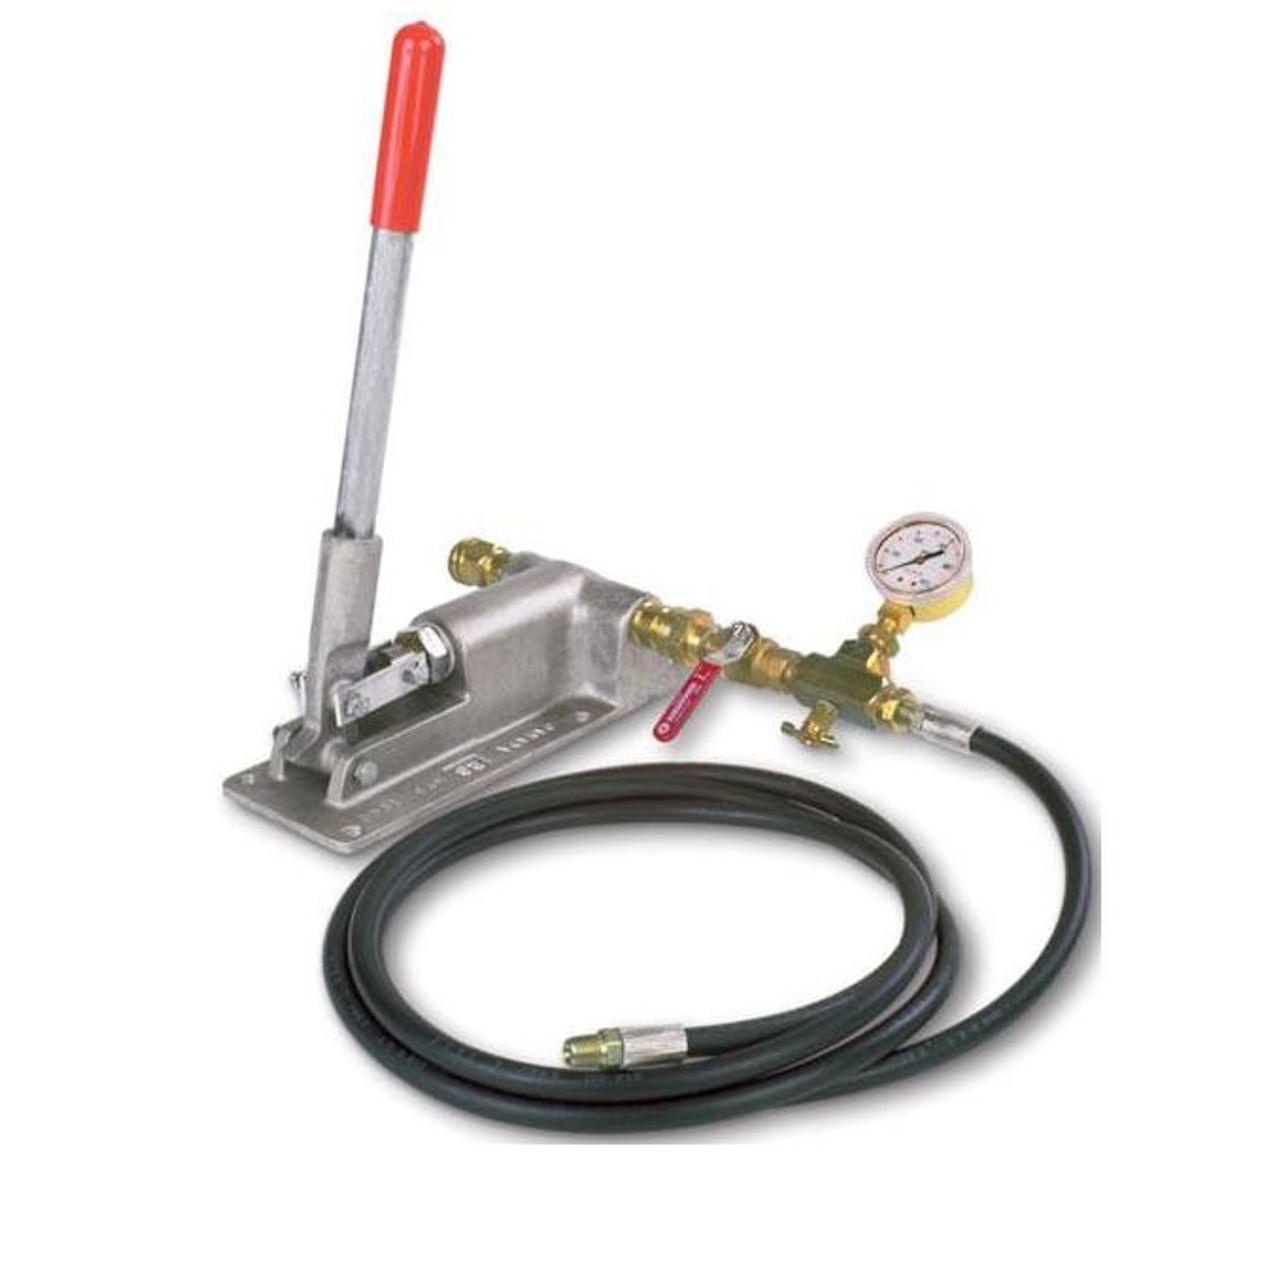 HTP - Hydrotest Pump